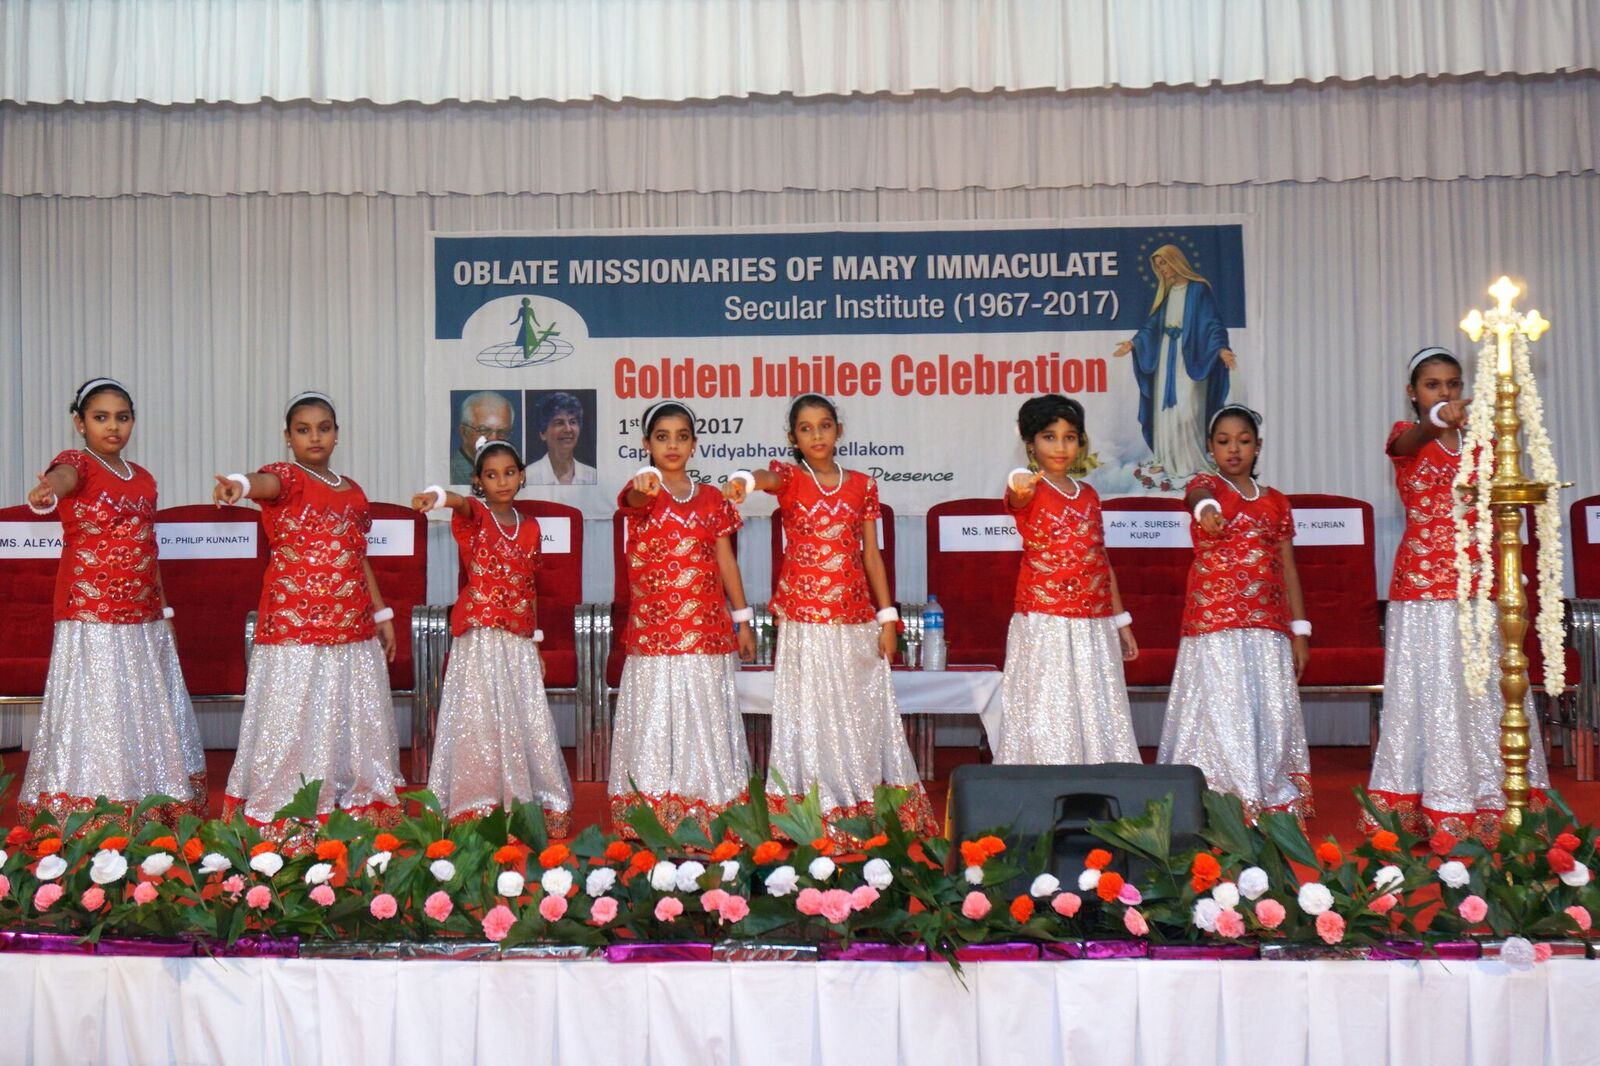 Celebration of the Golden jubilee – OMMI in India